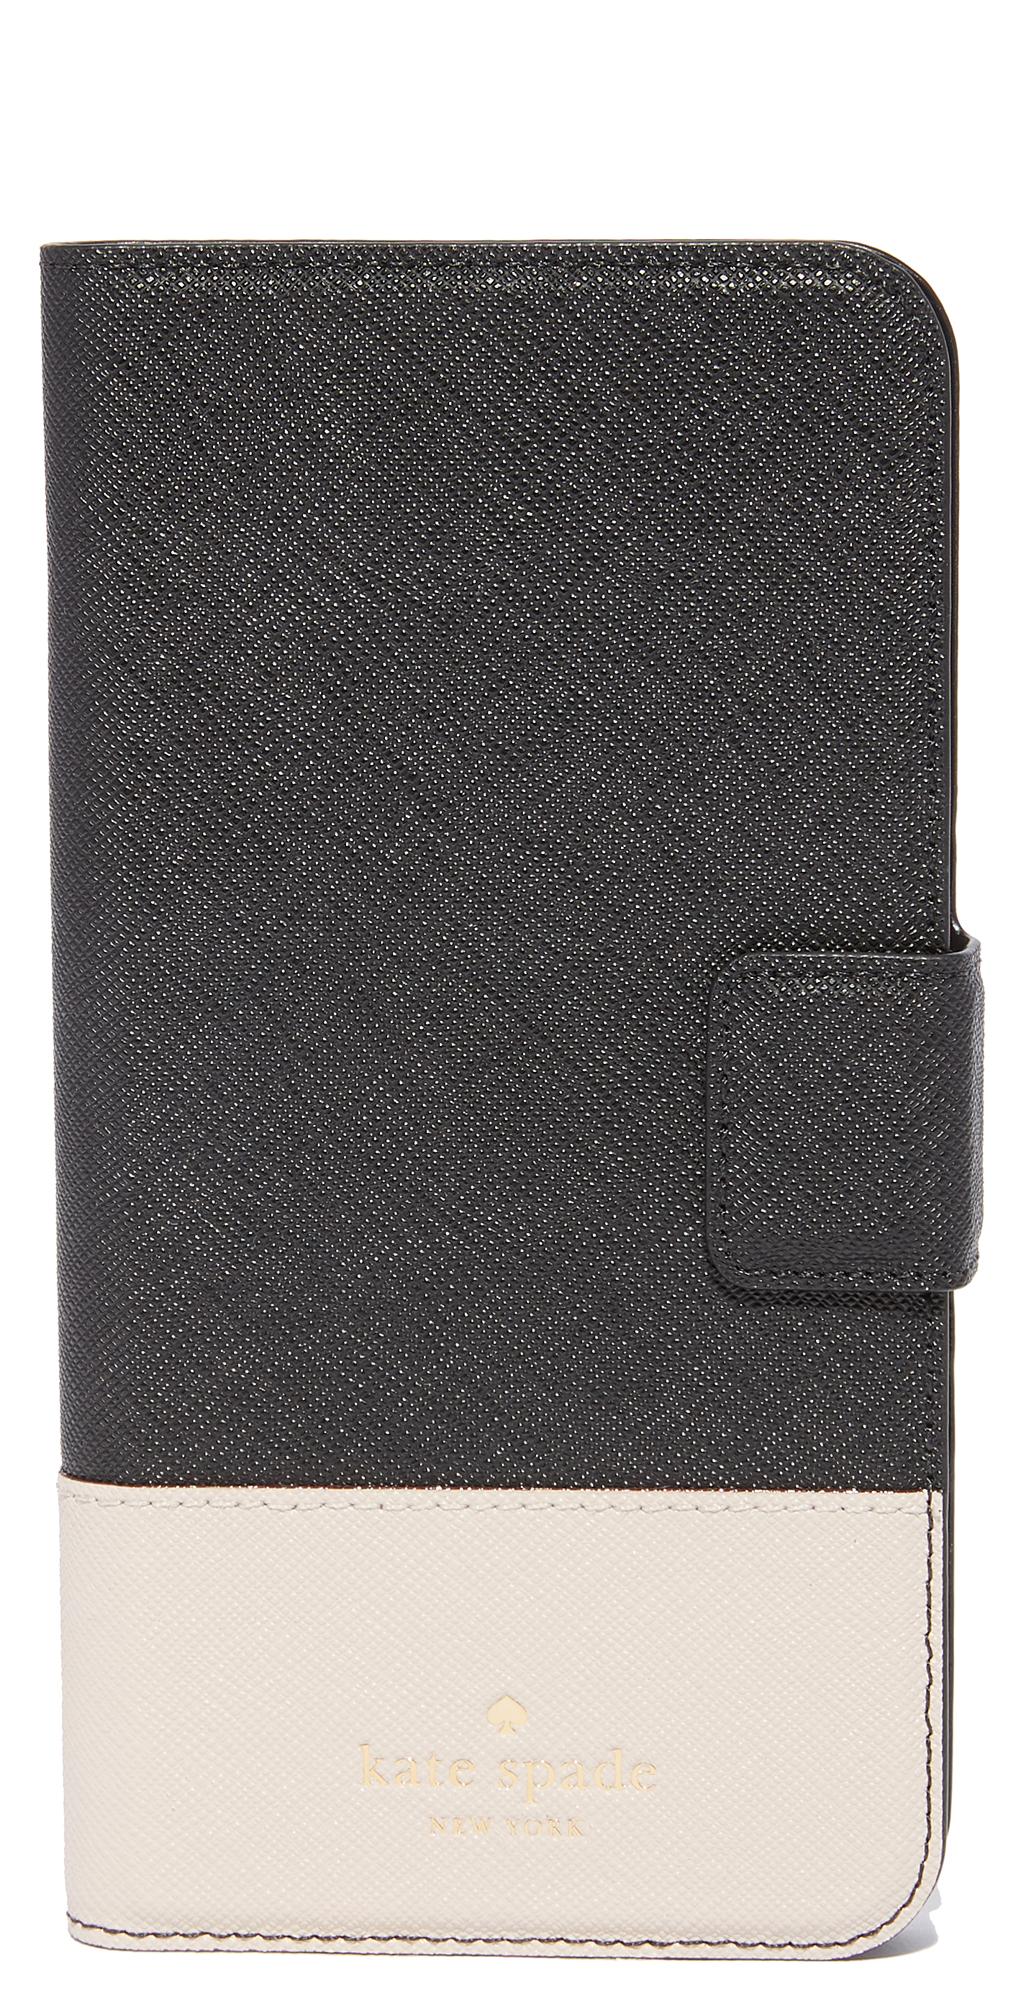 Leather Wrap Folio iPhone 7 Plus Case Kate Spade New York